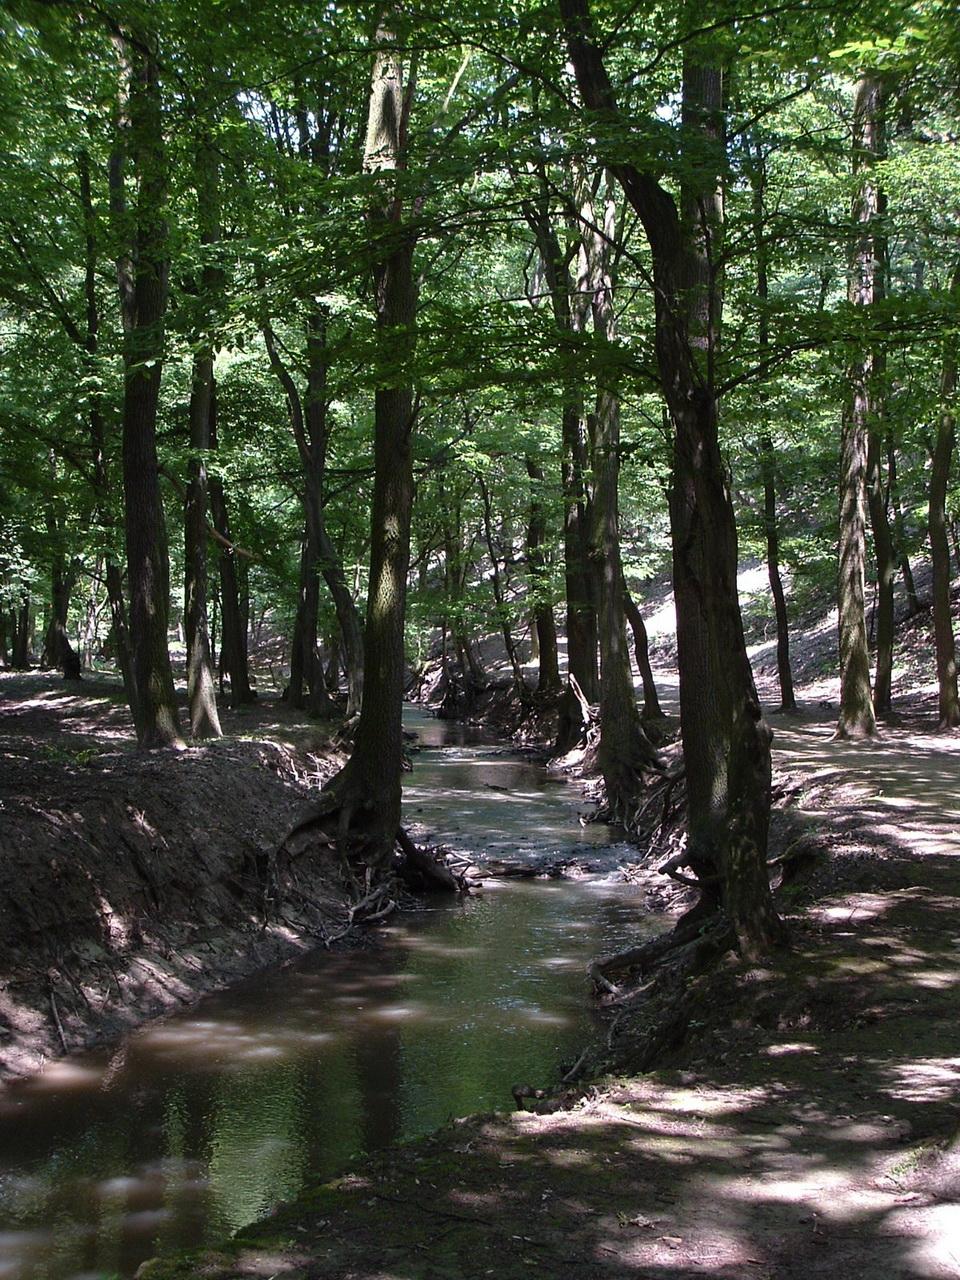 The path leads beside the Gaja Creek